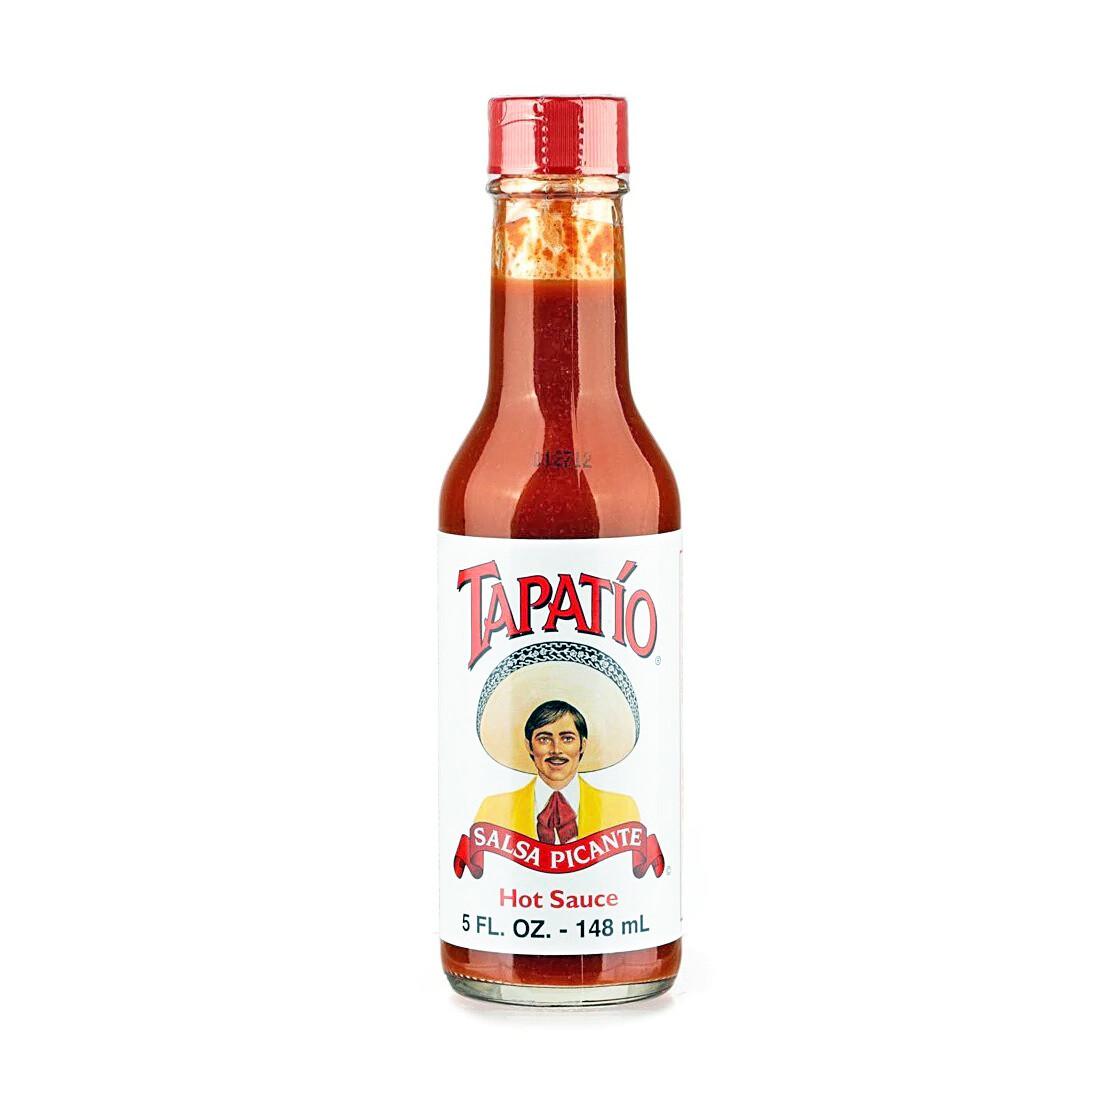 Tapatío Tulinen Kastike | Tapatío Hot Sauce | TAPATÍO | 148 ML